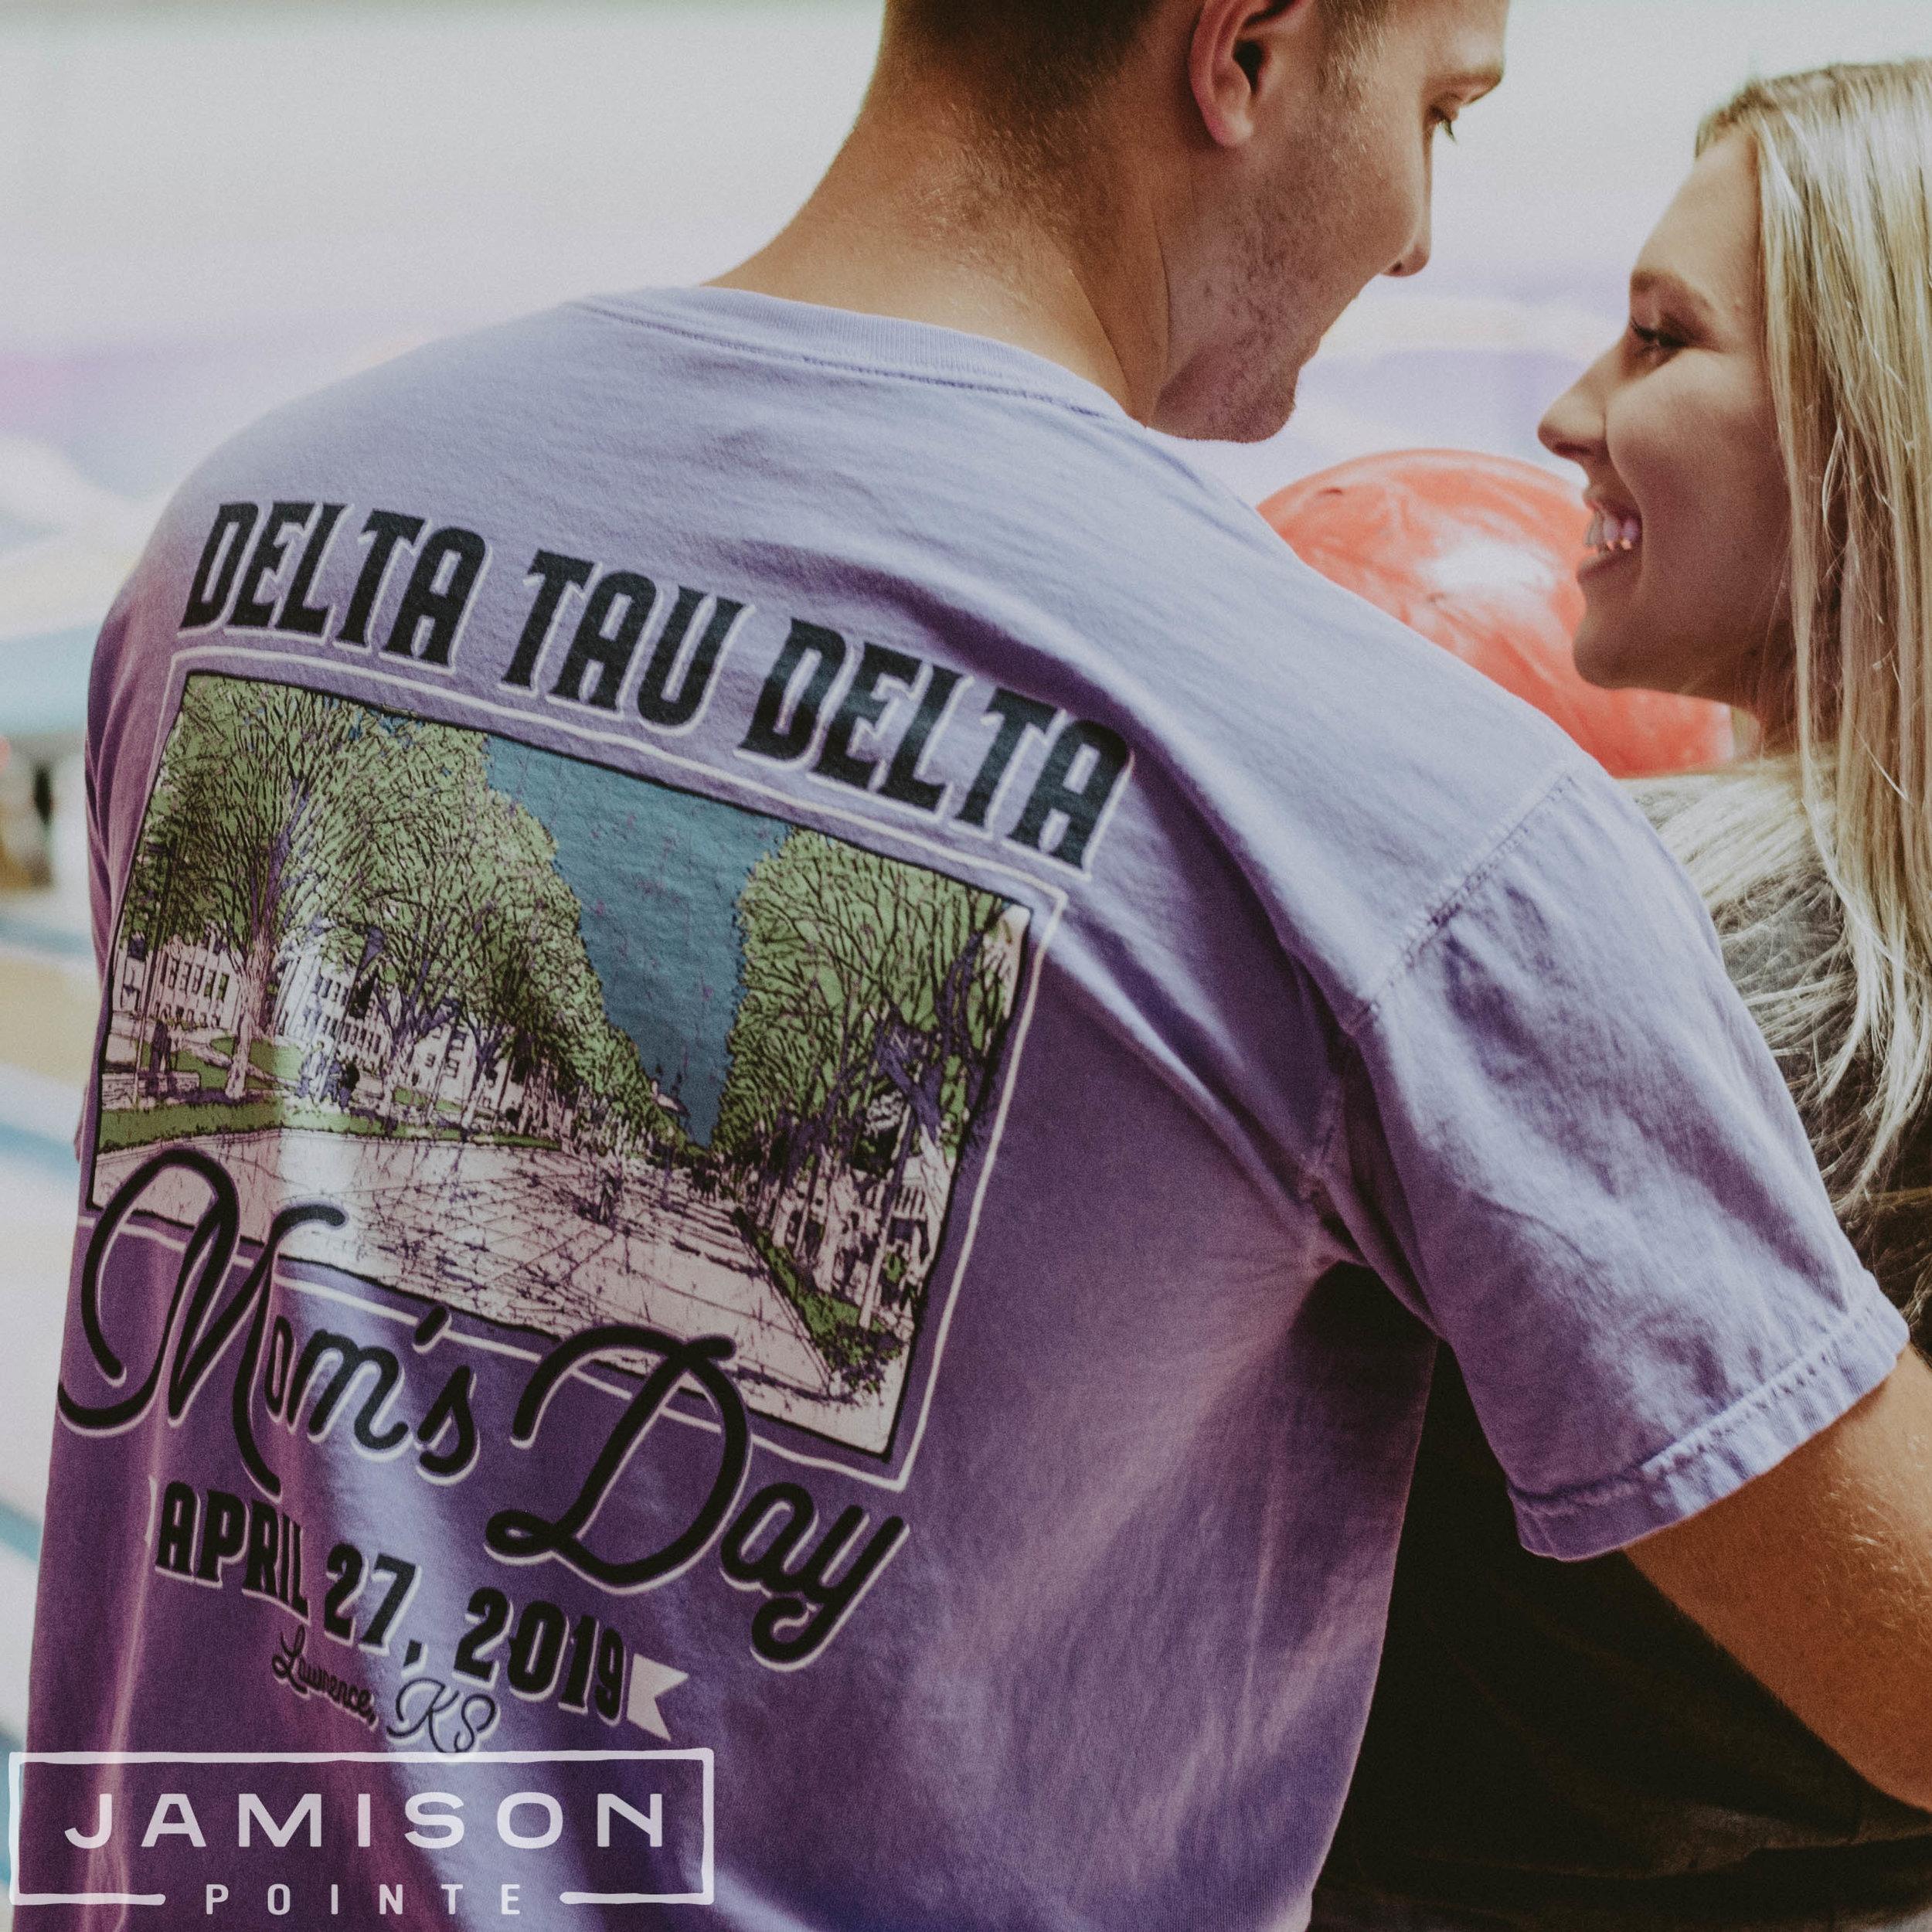 Delta Tau Delta Moms Day Tshirt